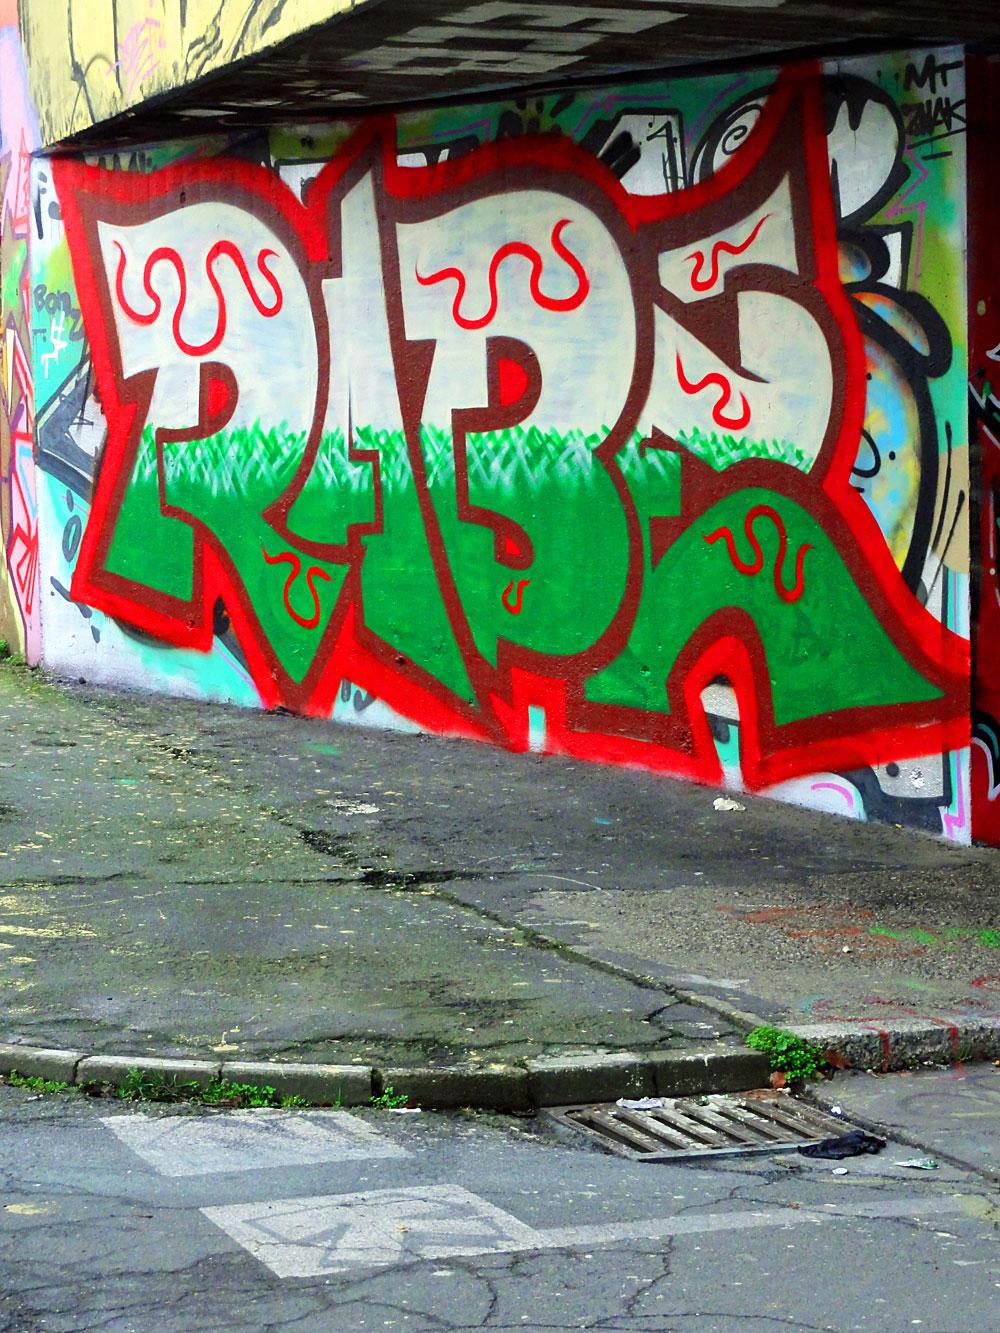 rabe-graffiti-hall-of-fame-frankfurt-ratsweg-unterfuehrung